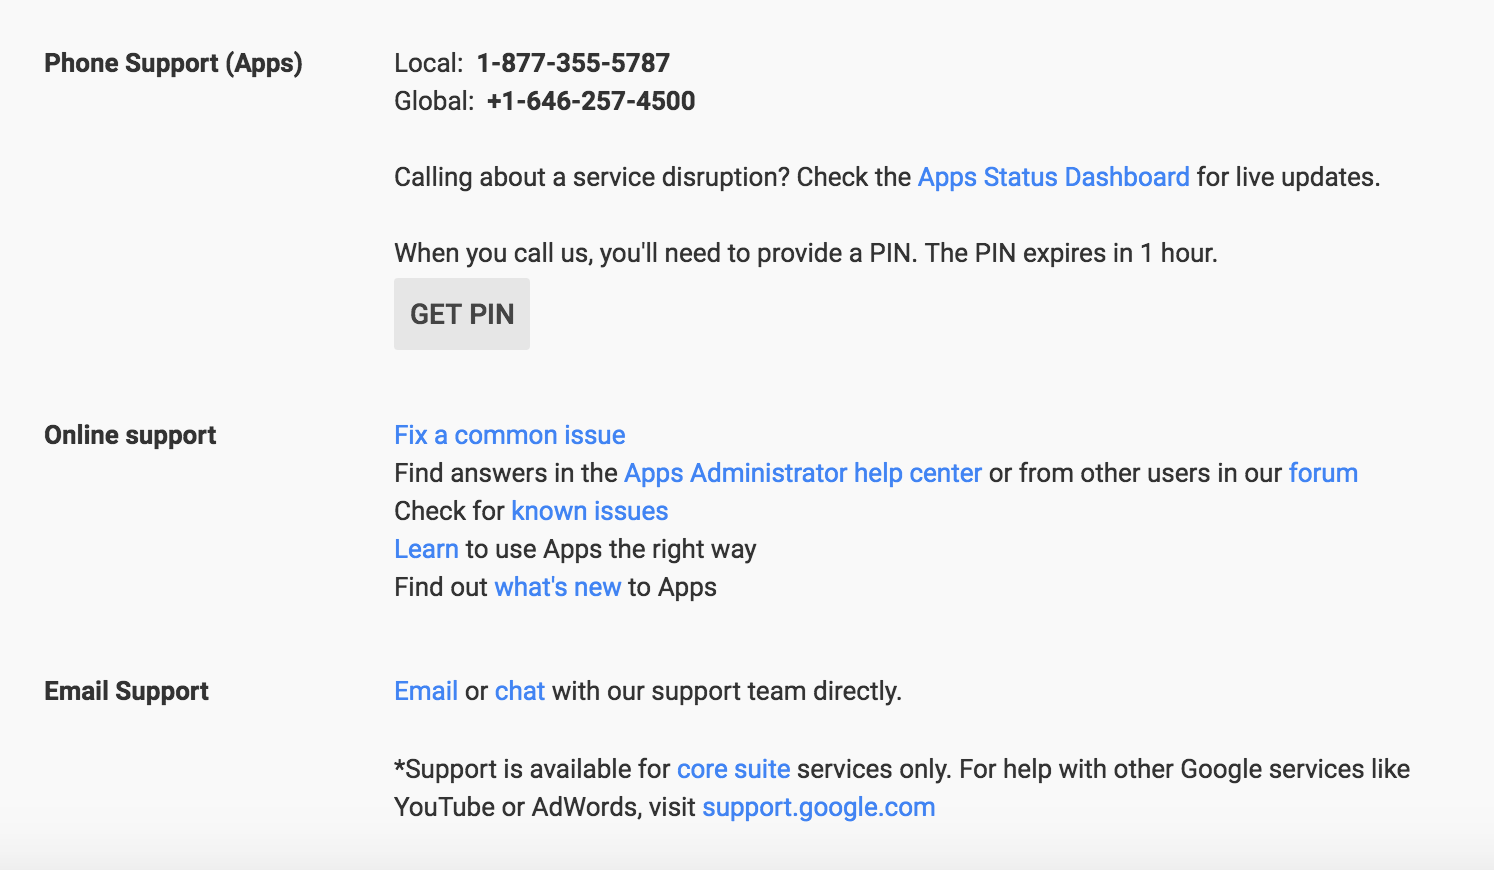 google-pin-to-call